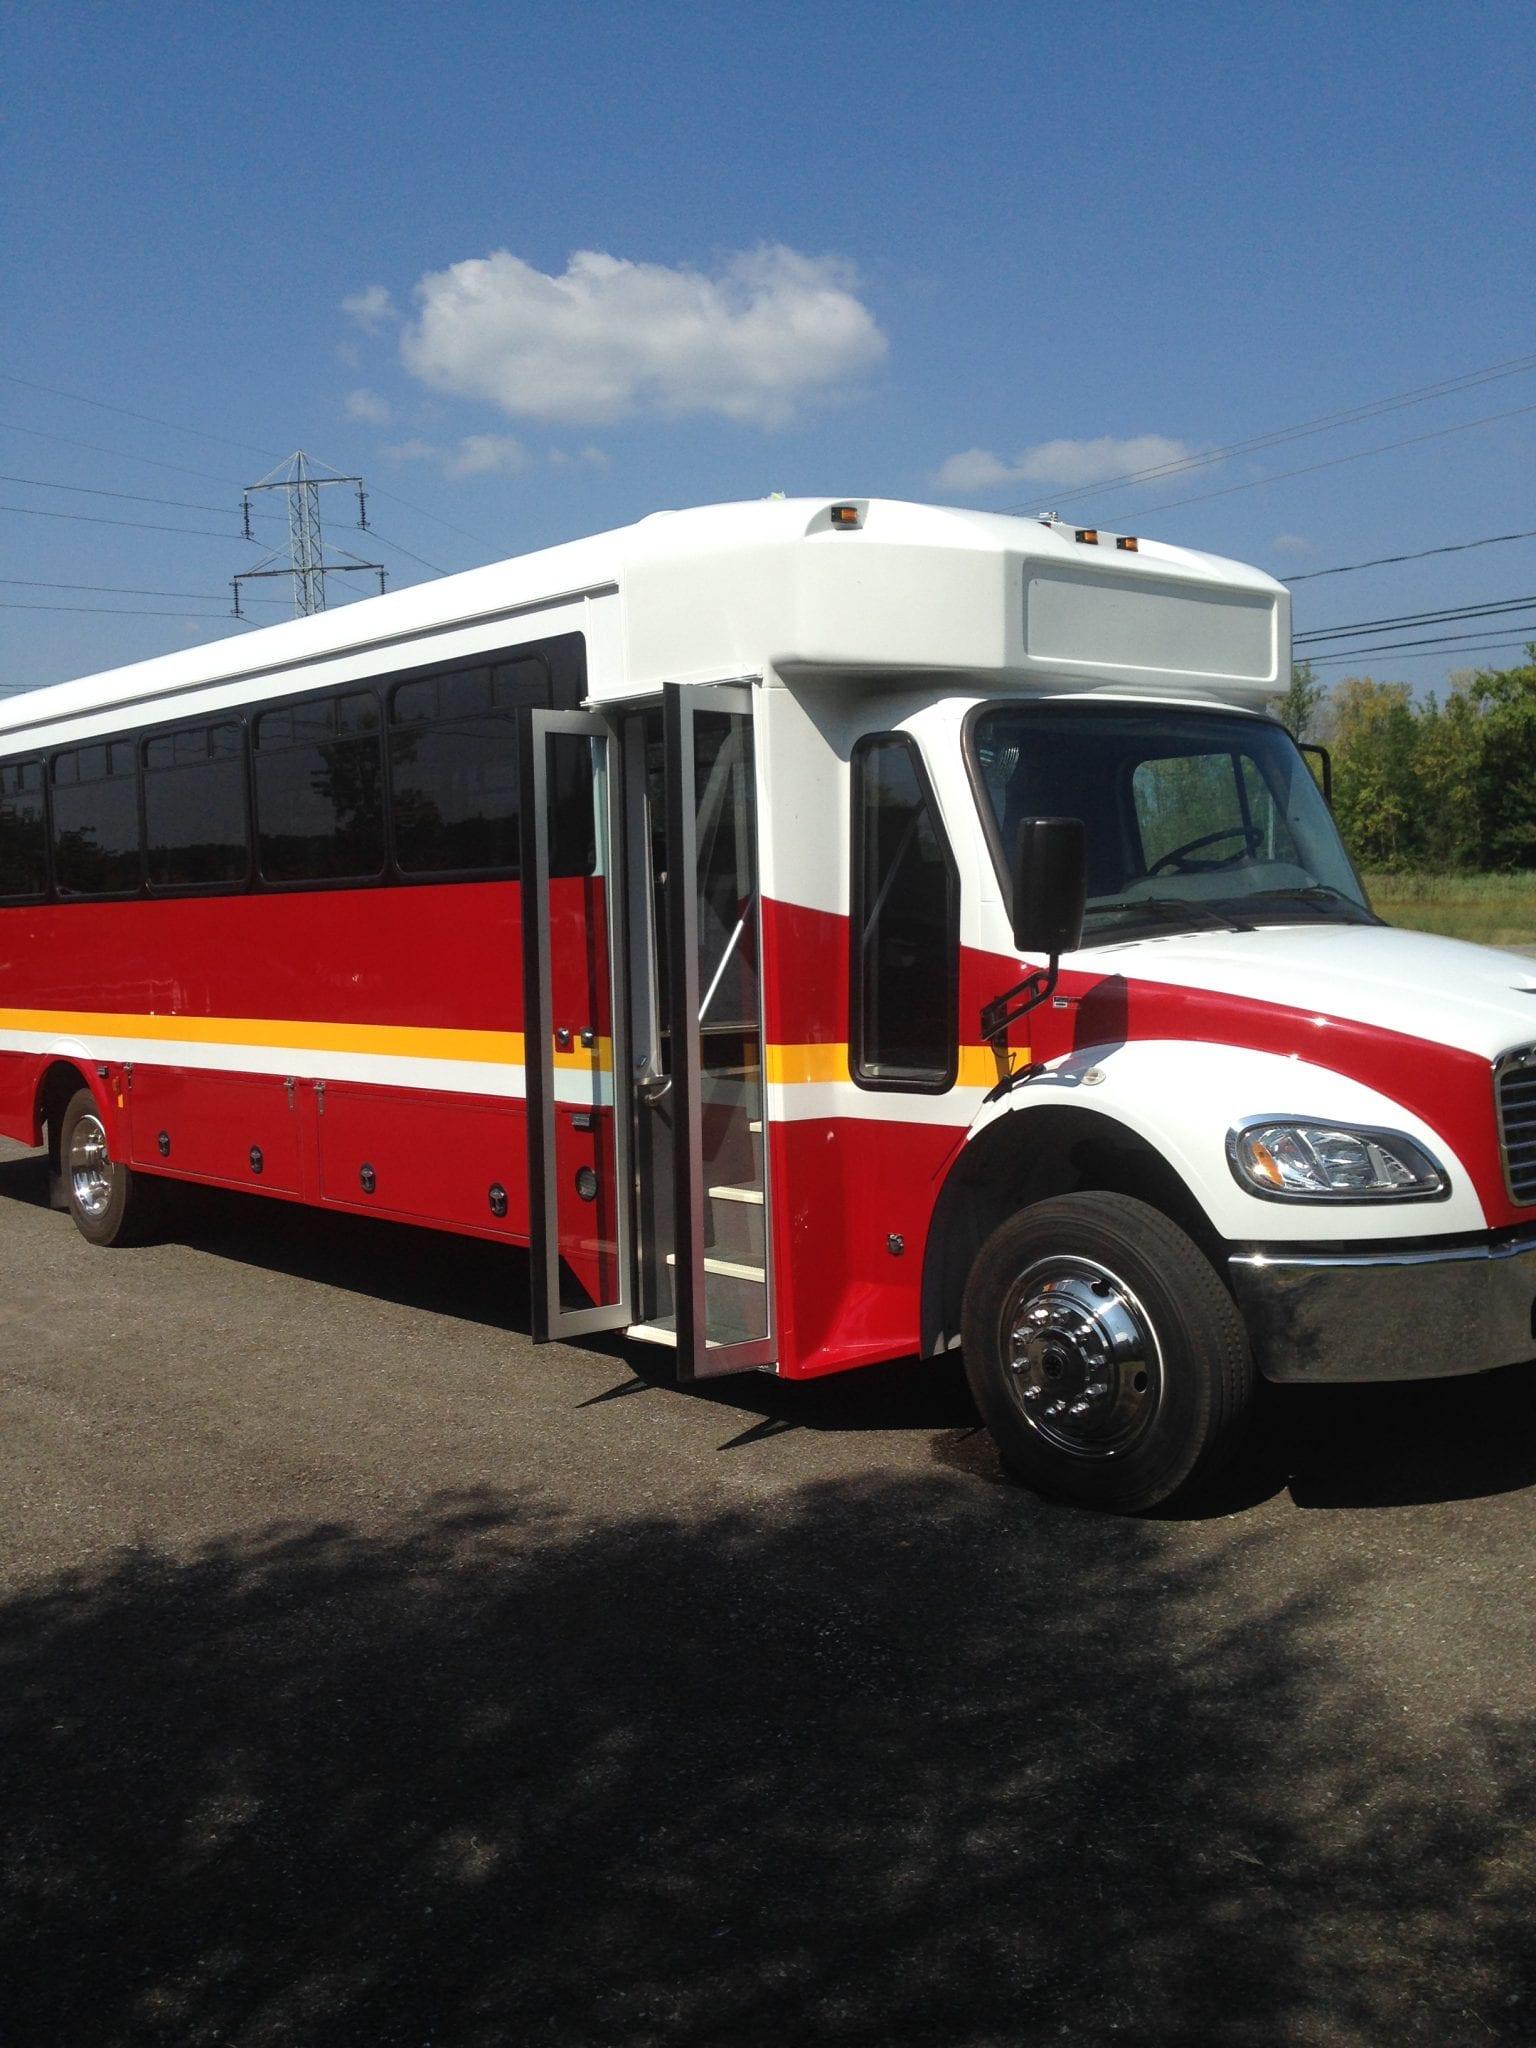 Fireman's Activity Bus A